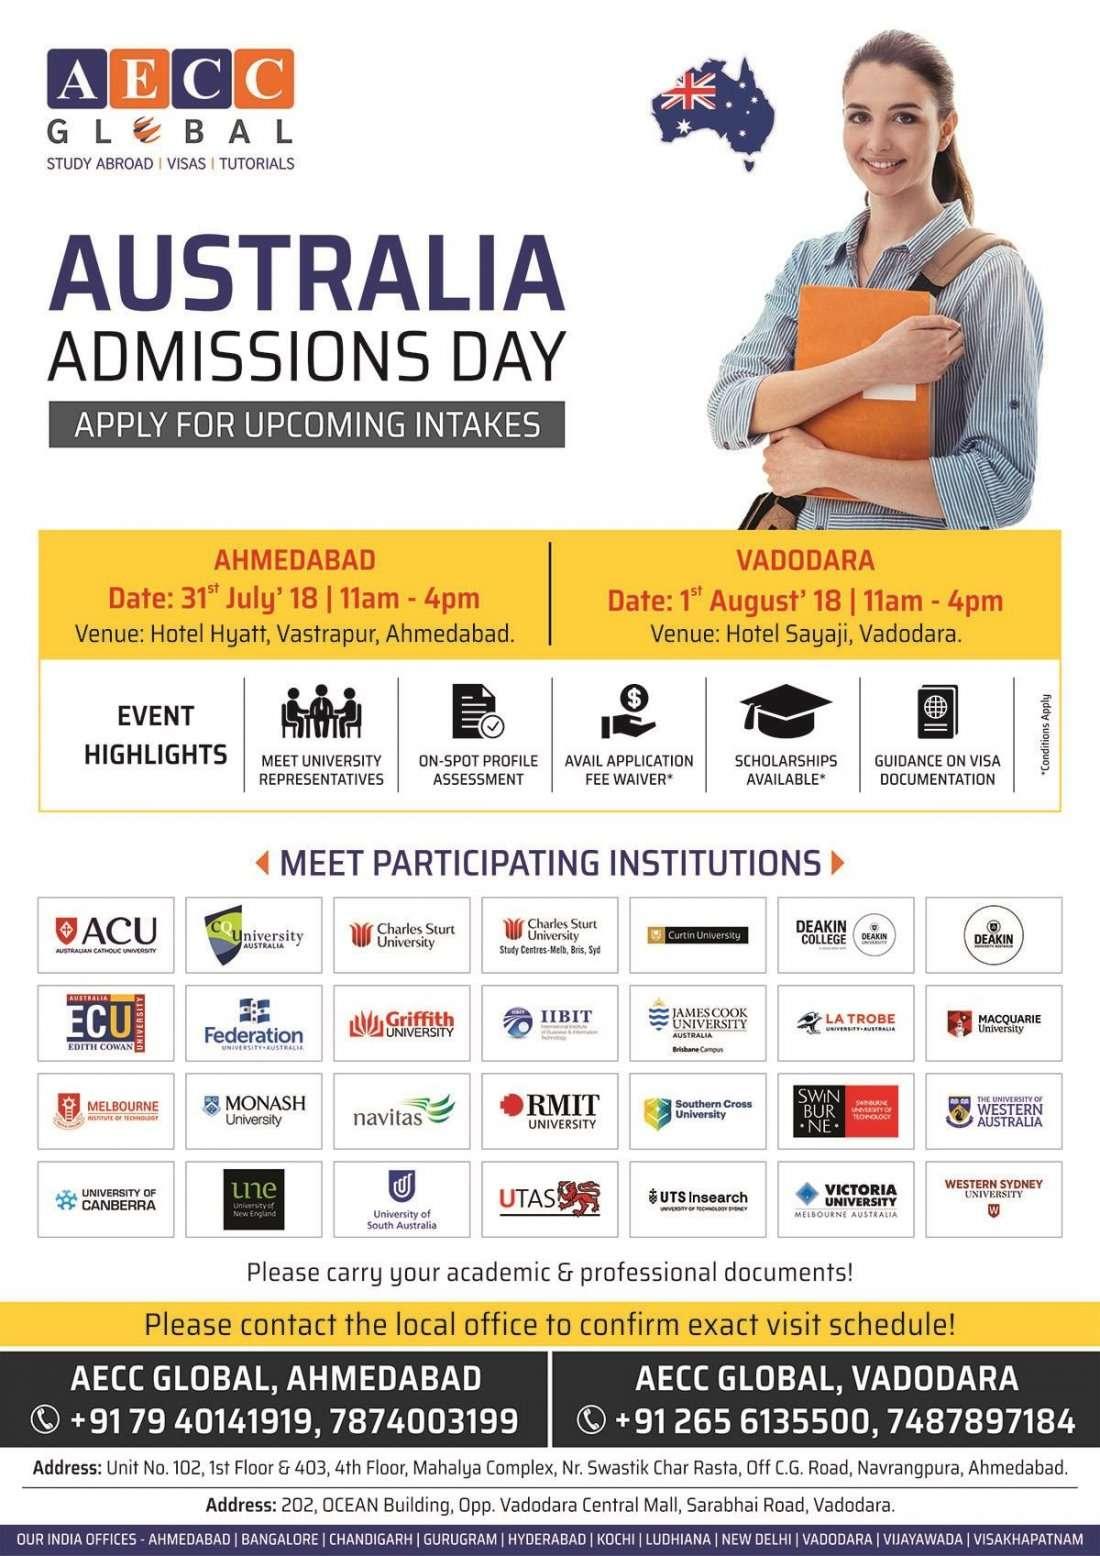 AECCs Australia Admissions Day